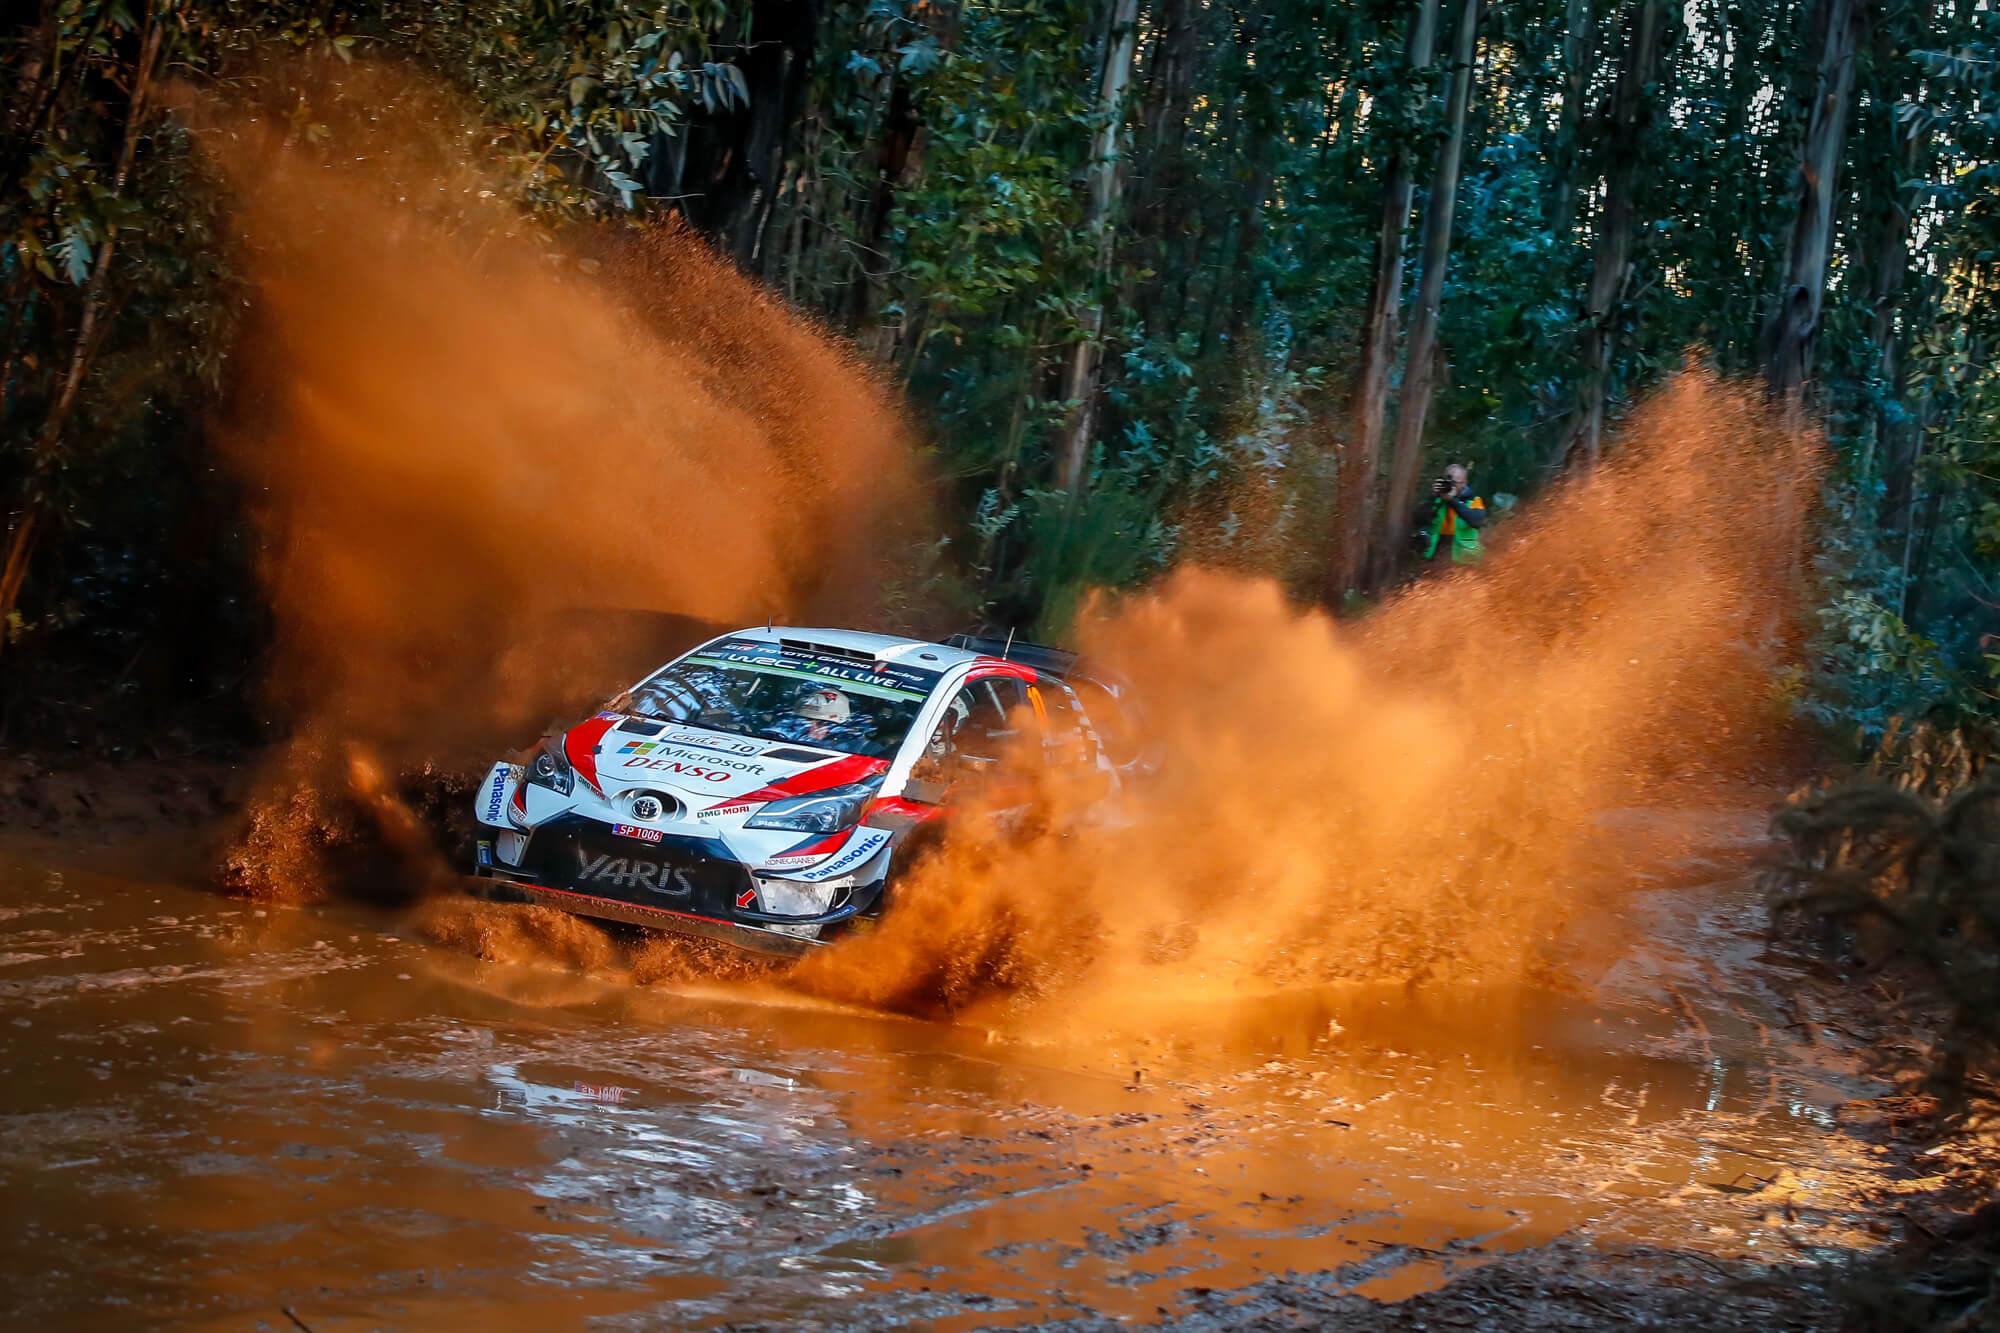 WRC_2019_Rd6_113 (002).jpg